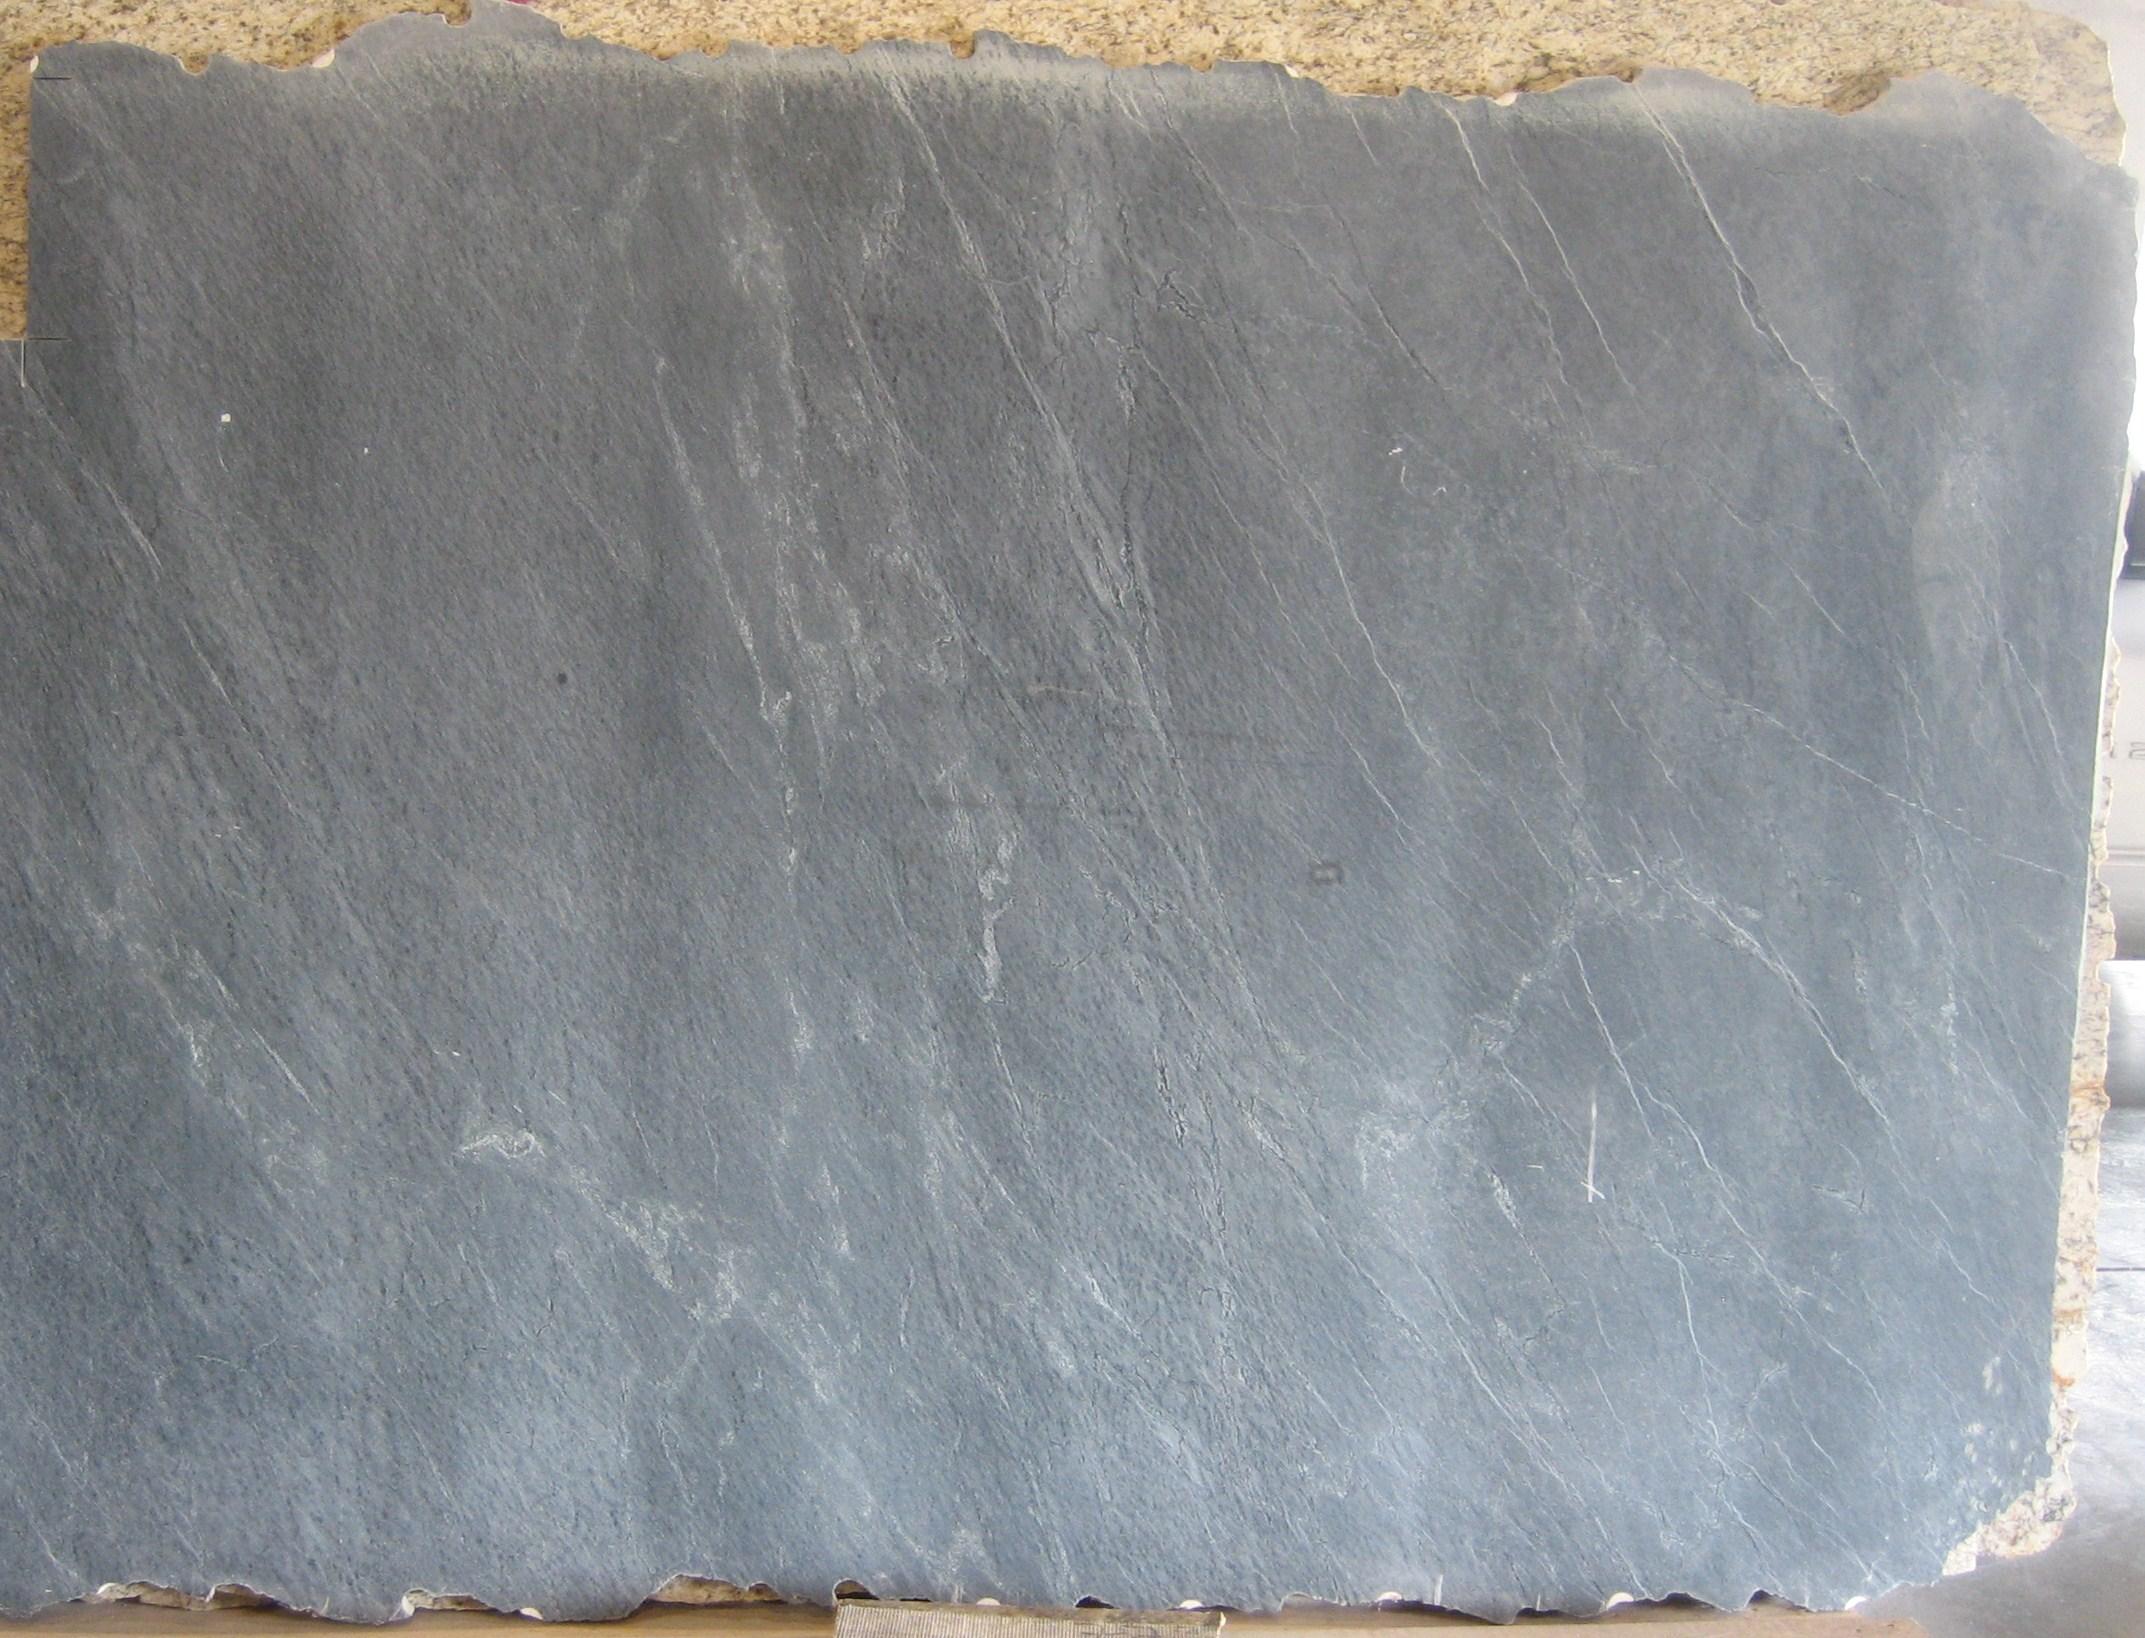 Habitat Stone - Quality Soapstone Importers and Distributors